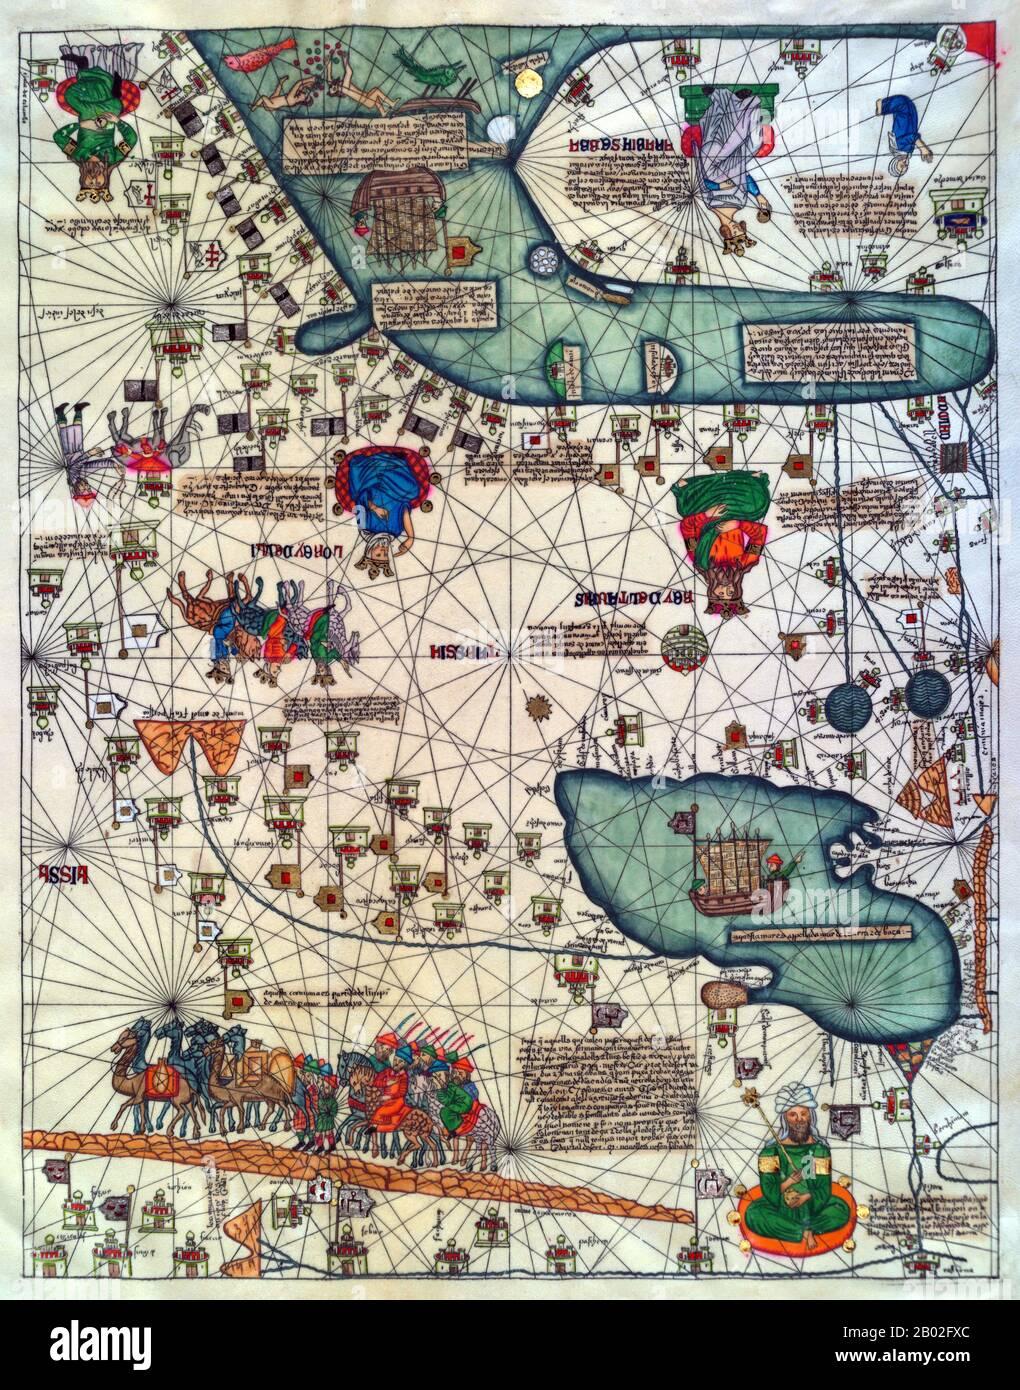 Carte Du Voyage De Marco Polo : carte, voyage, marco, Marco, Resolution, Stock, Photography, Images, Alamy